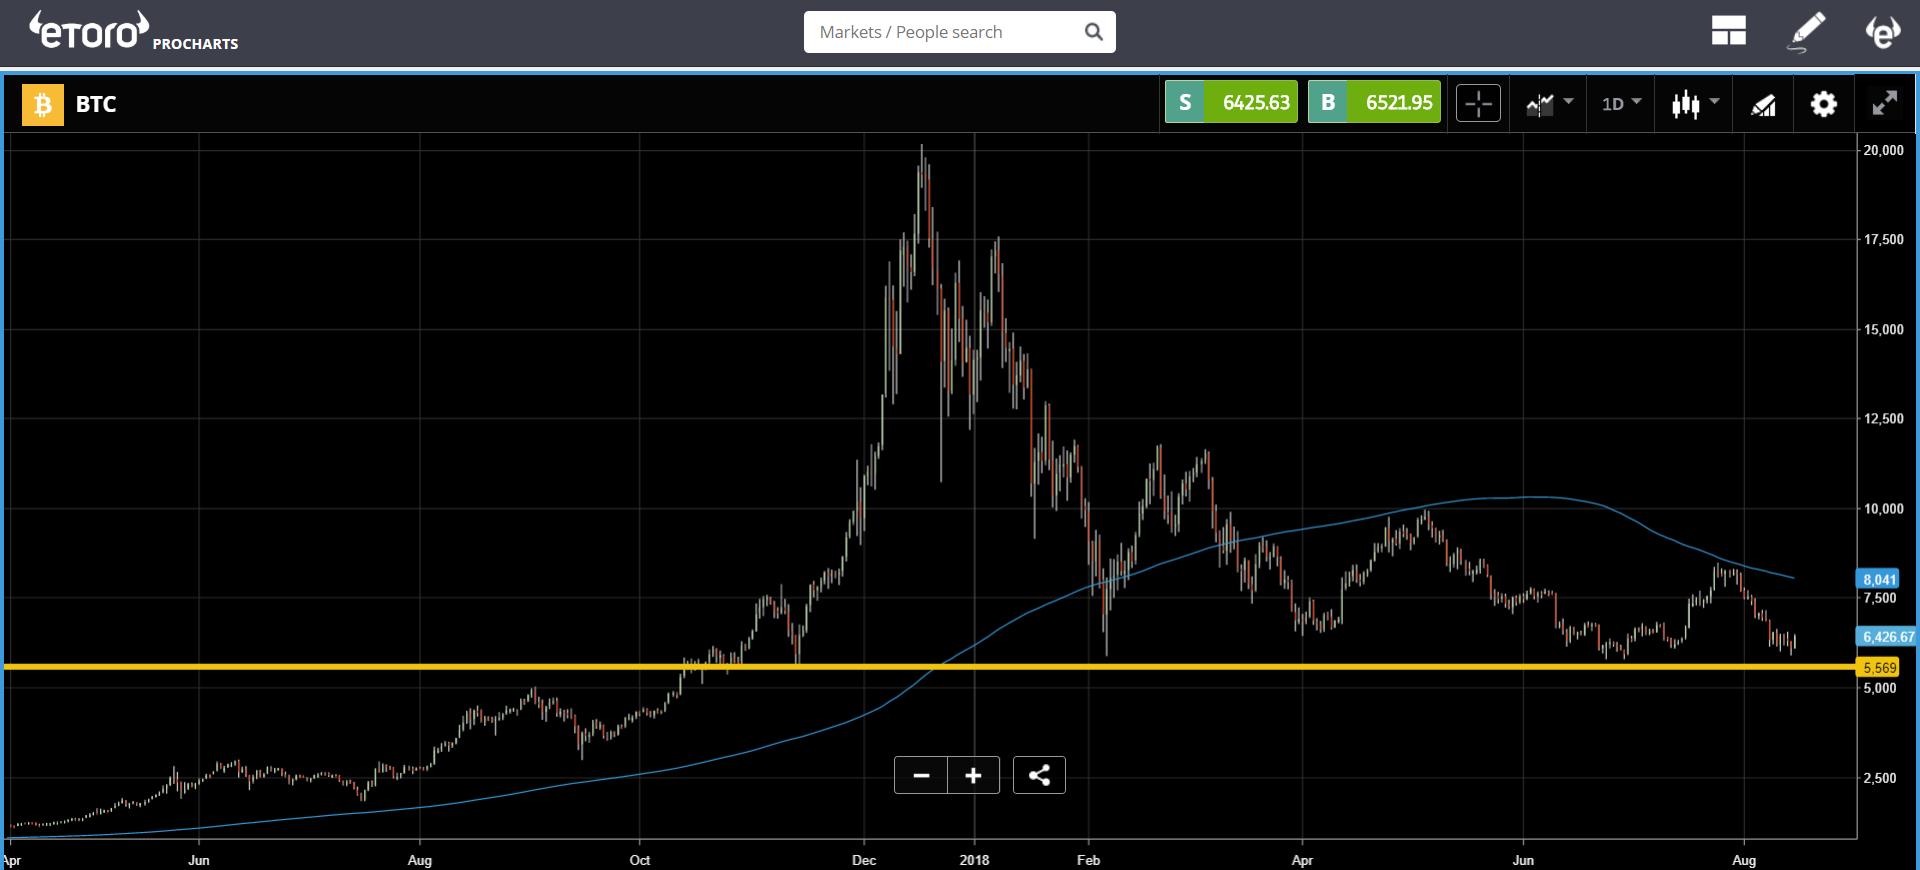 etoro, cryptocurrency, markets, trading, lira, dollar, bitcoin